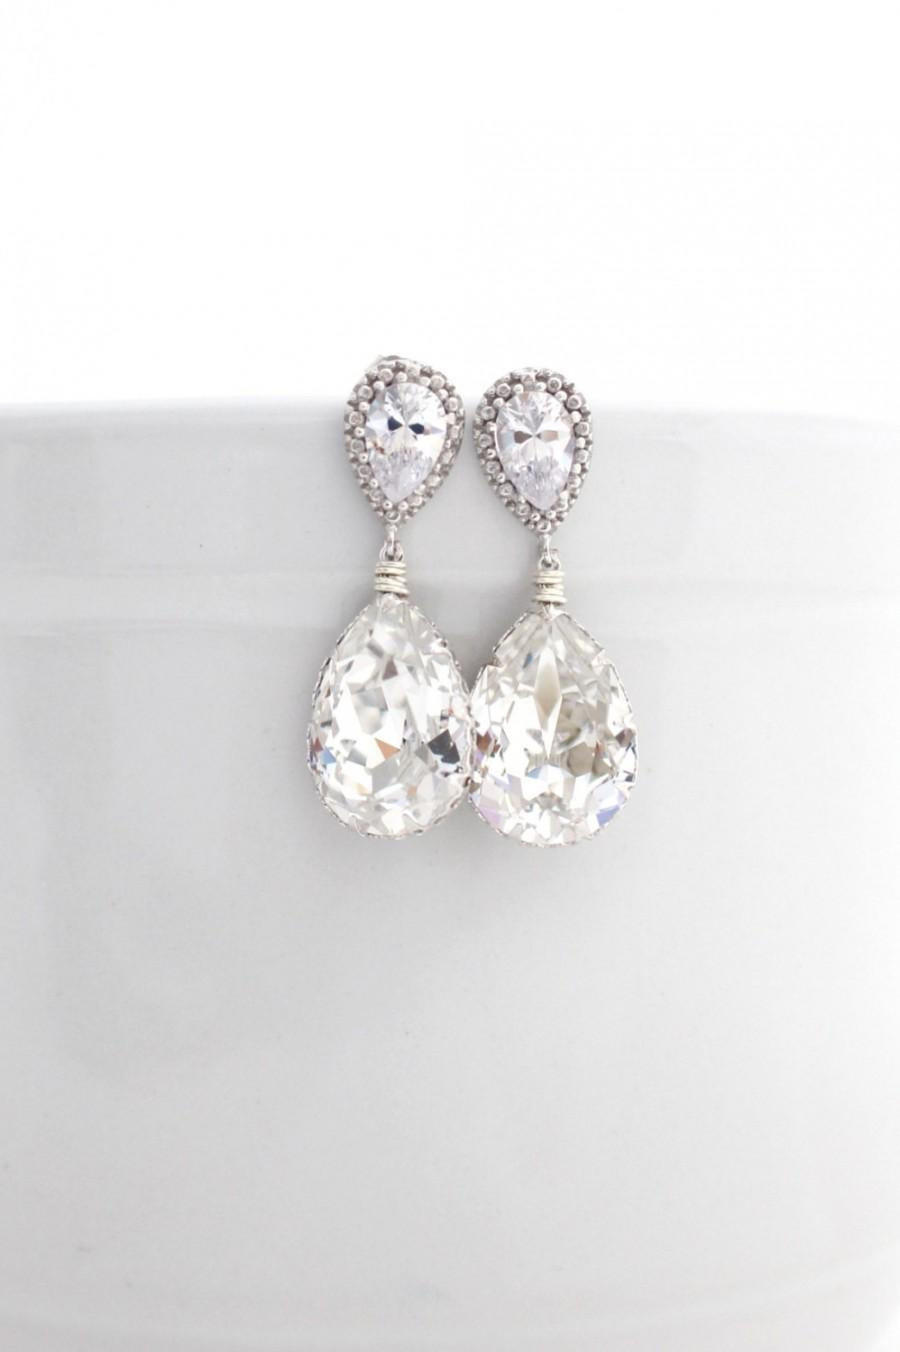 Mariage - Clear Bridal Swarovski Drop Earrings Sterling Silver Cubic Zirconia Jewelry for Bride Bridesmaid Post Dangle Wedding Earings Rhinestone